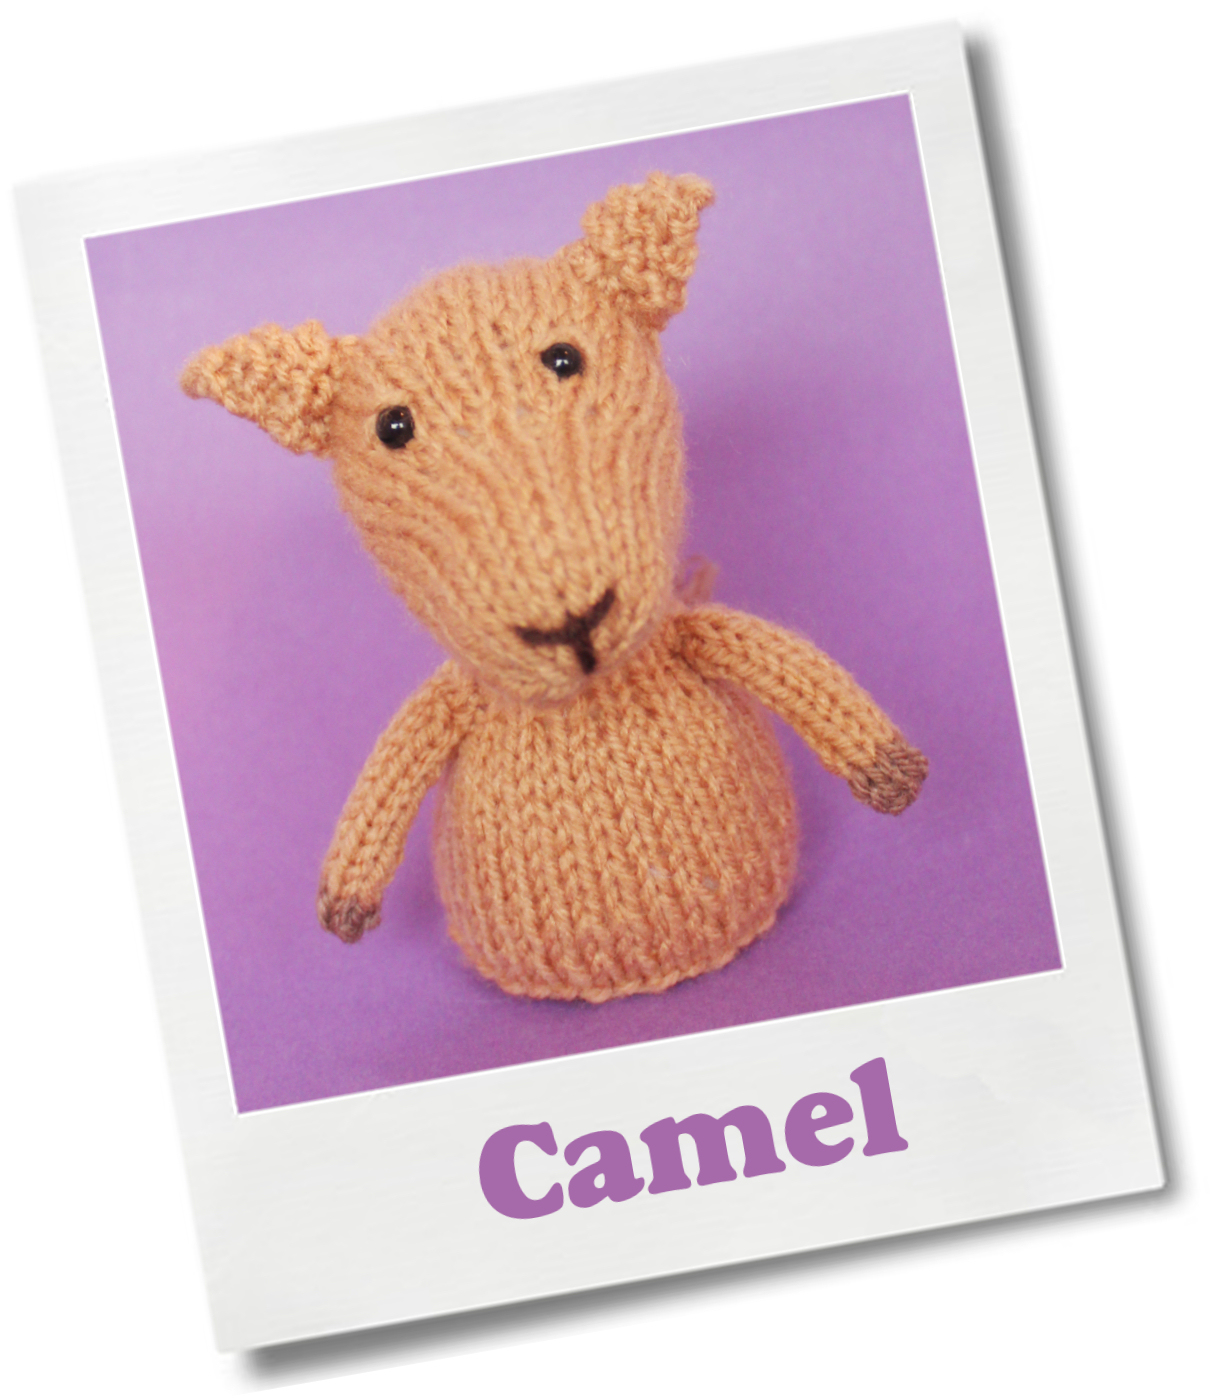 Jelly Bums: Camel Knitting Pattern